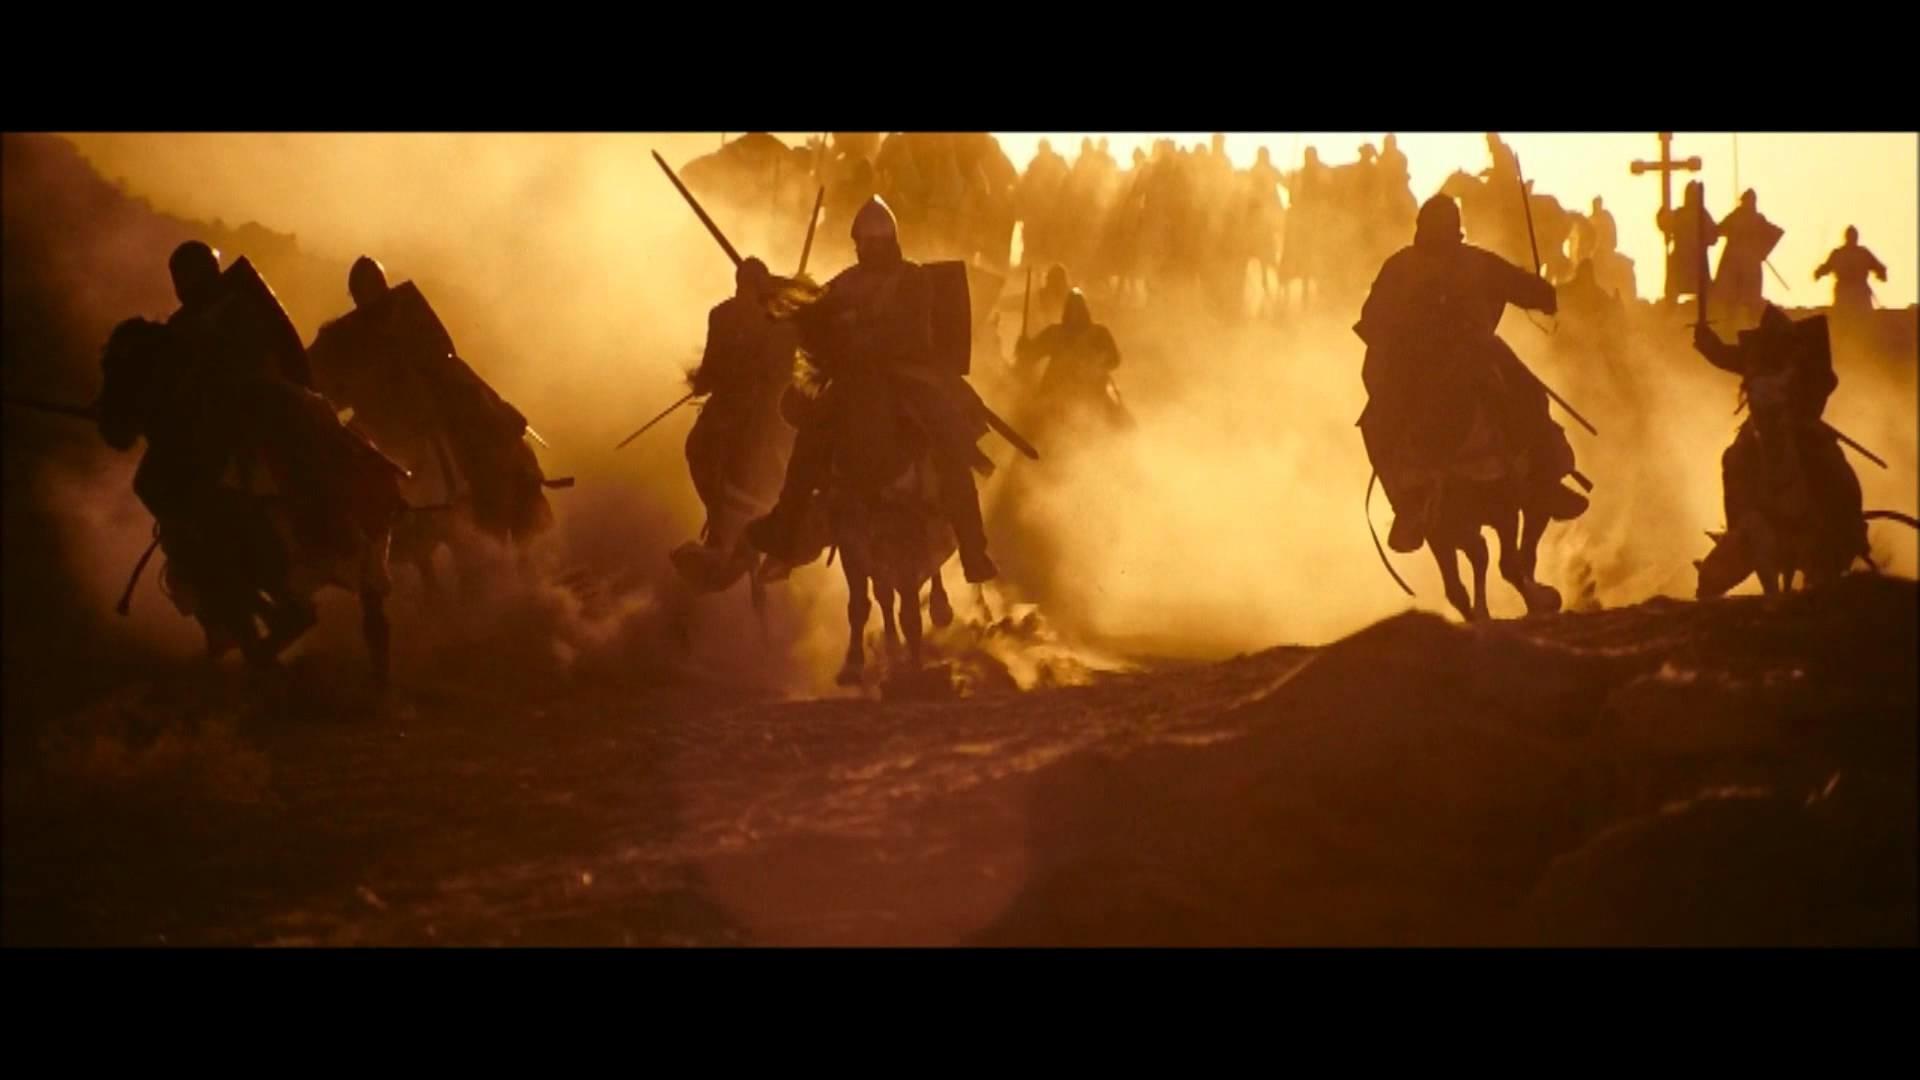 Arn The Knight Templar Wallpaper Viewing Gallery